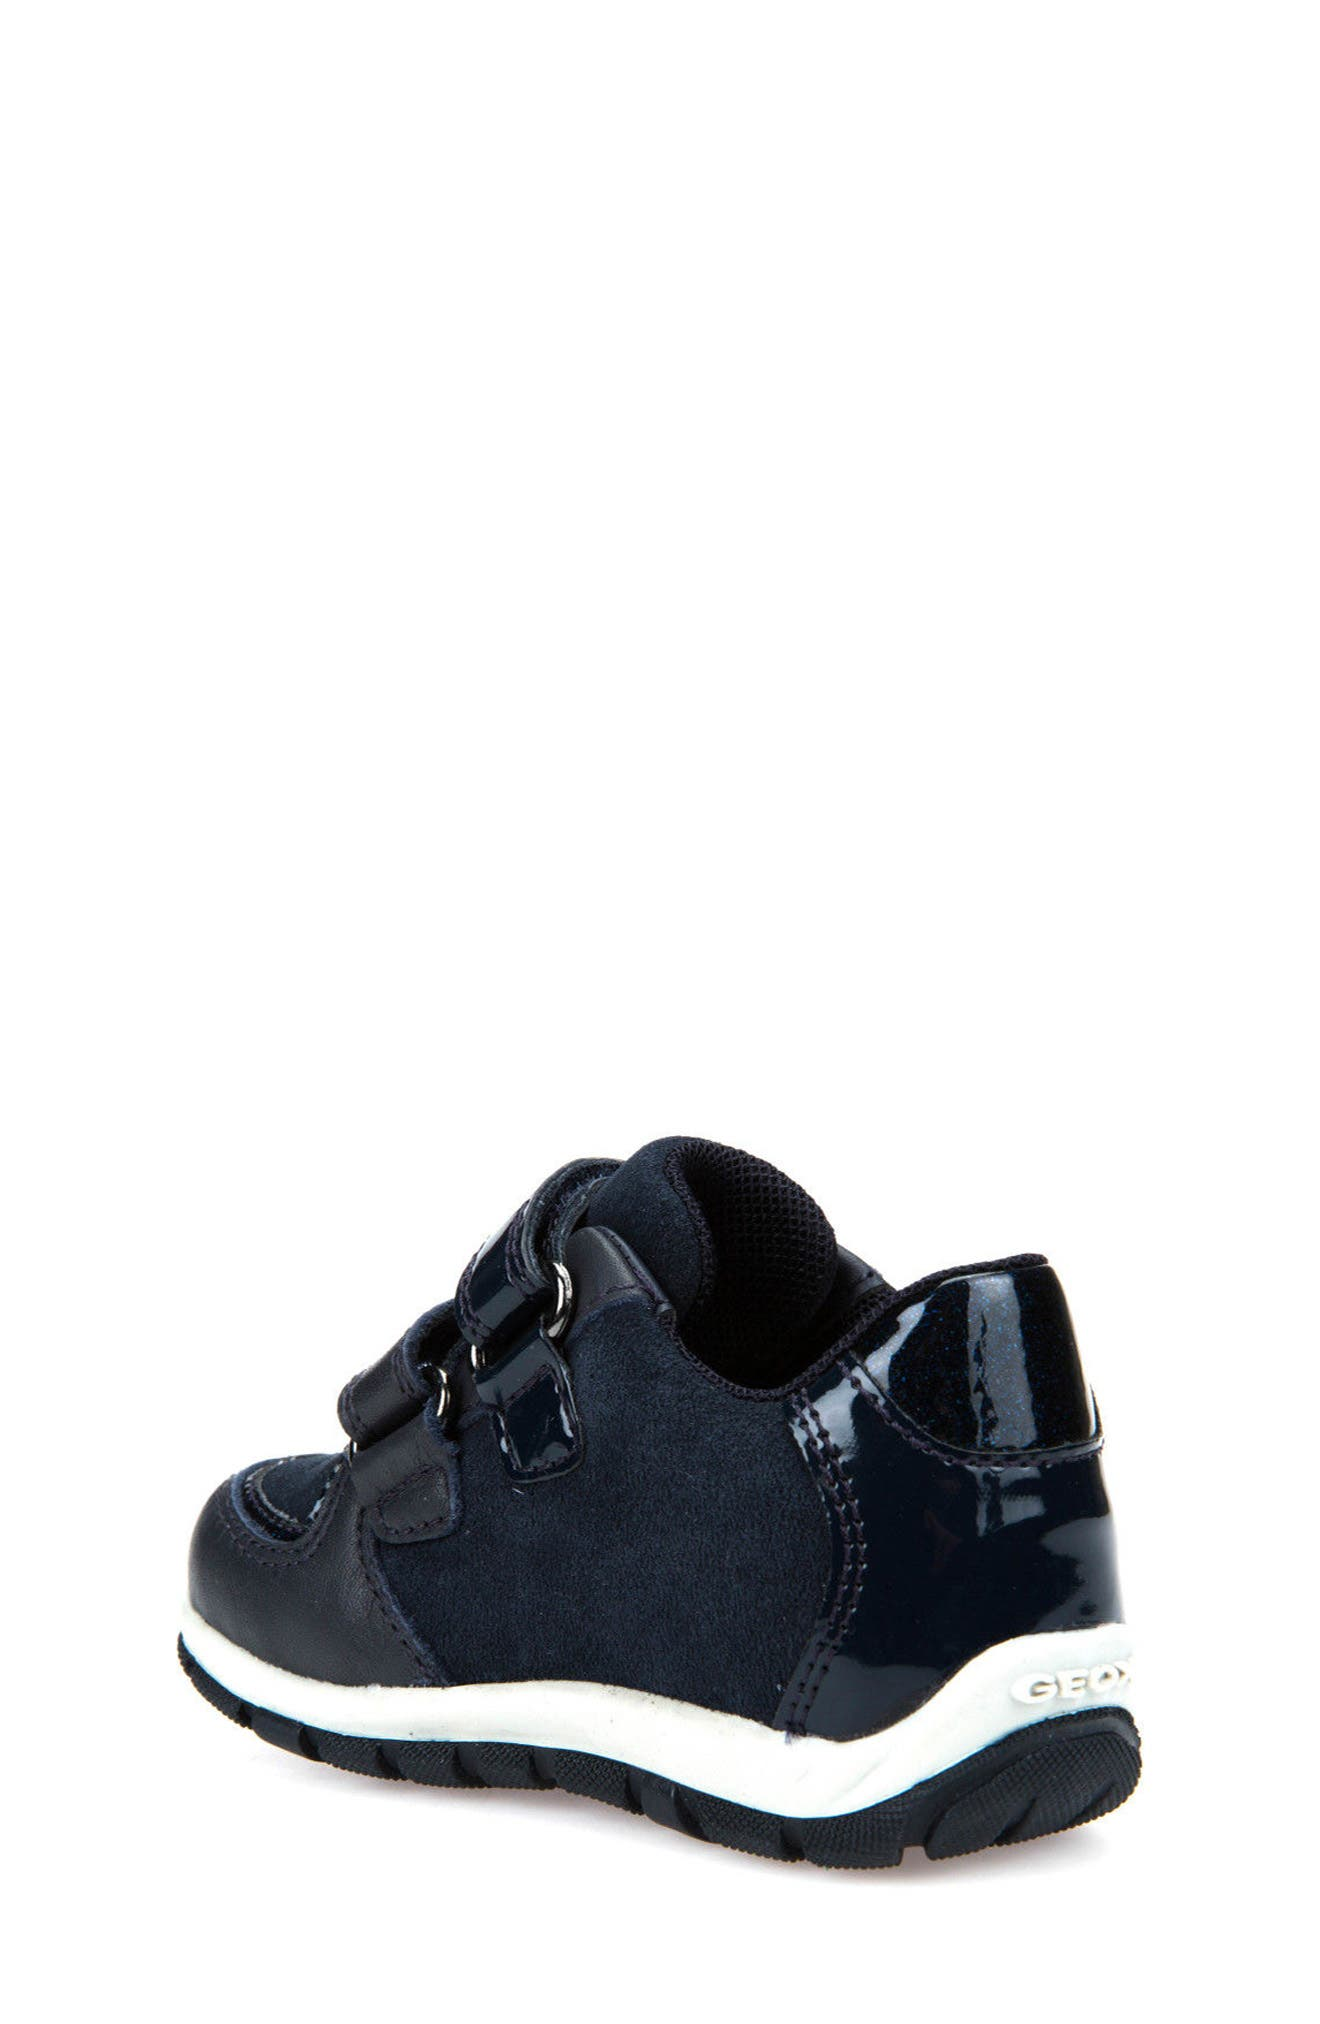 Alternate Image 2  - Geox Shaax Love Sneaker (Walker & Toddler)